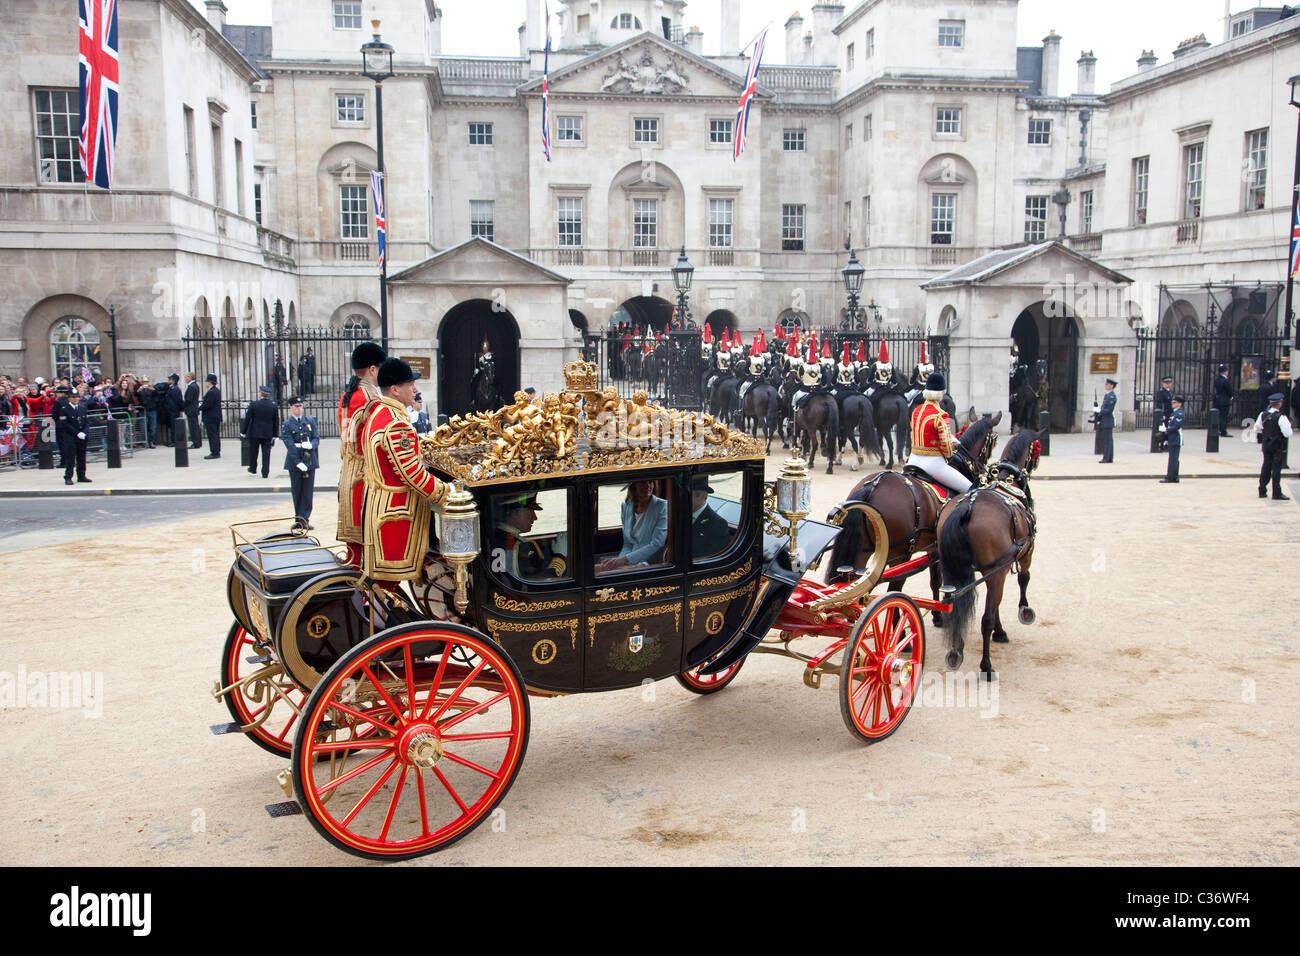 royal carriage royal wedding horse guards whitehall london uk stock photo royalty free image. Black Bedroom Furniture Sets. Home Design Ideas